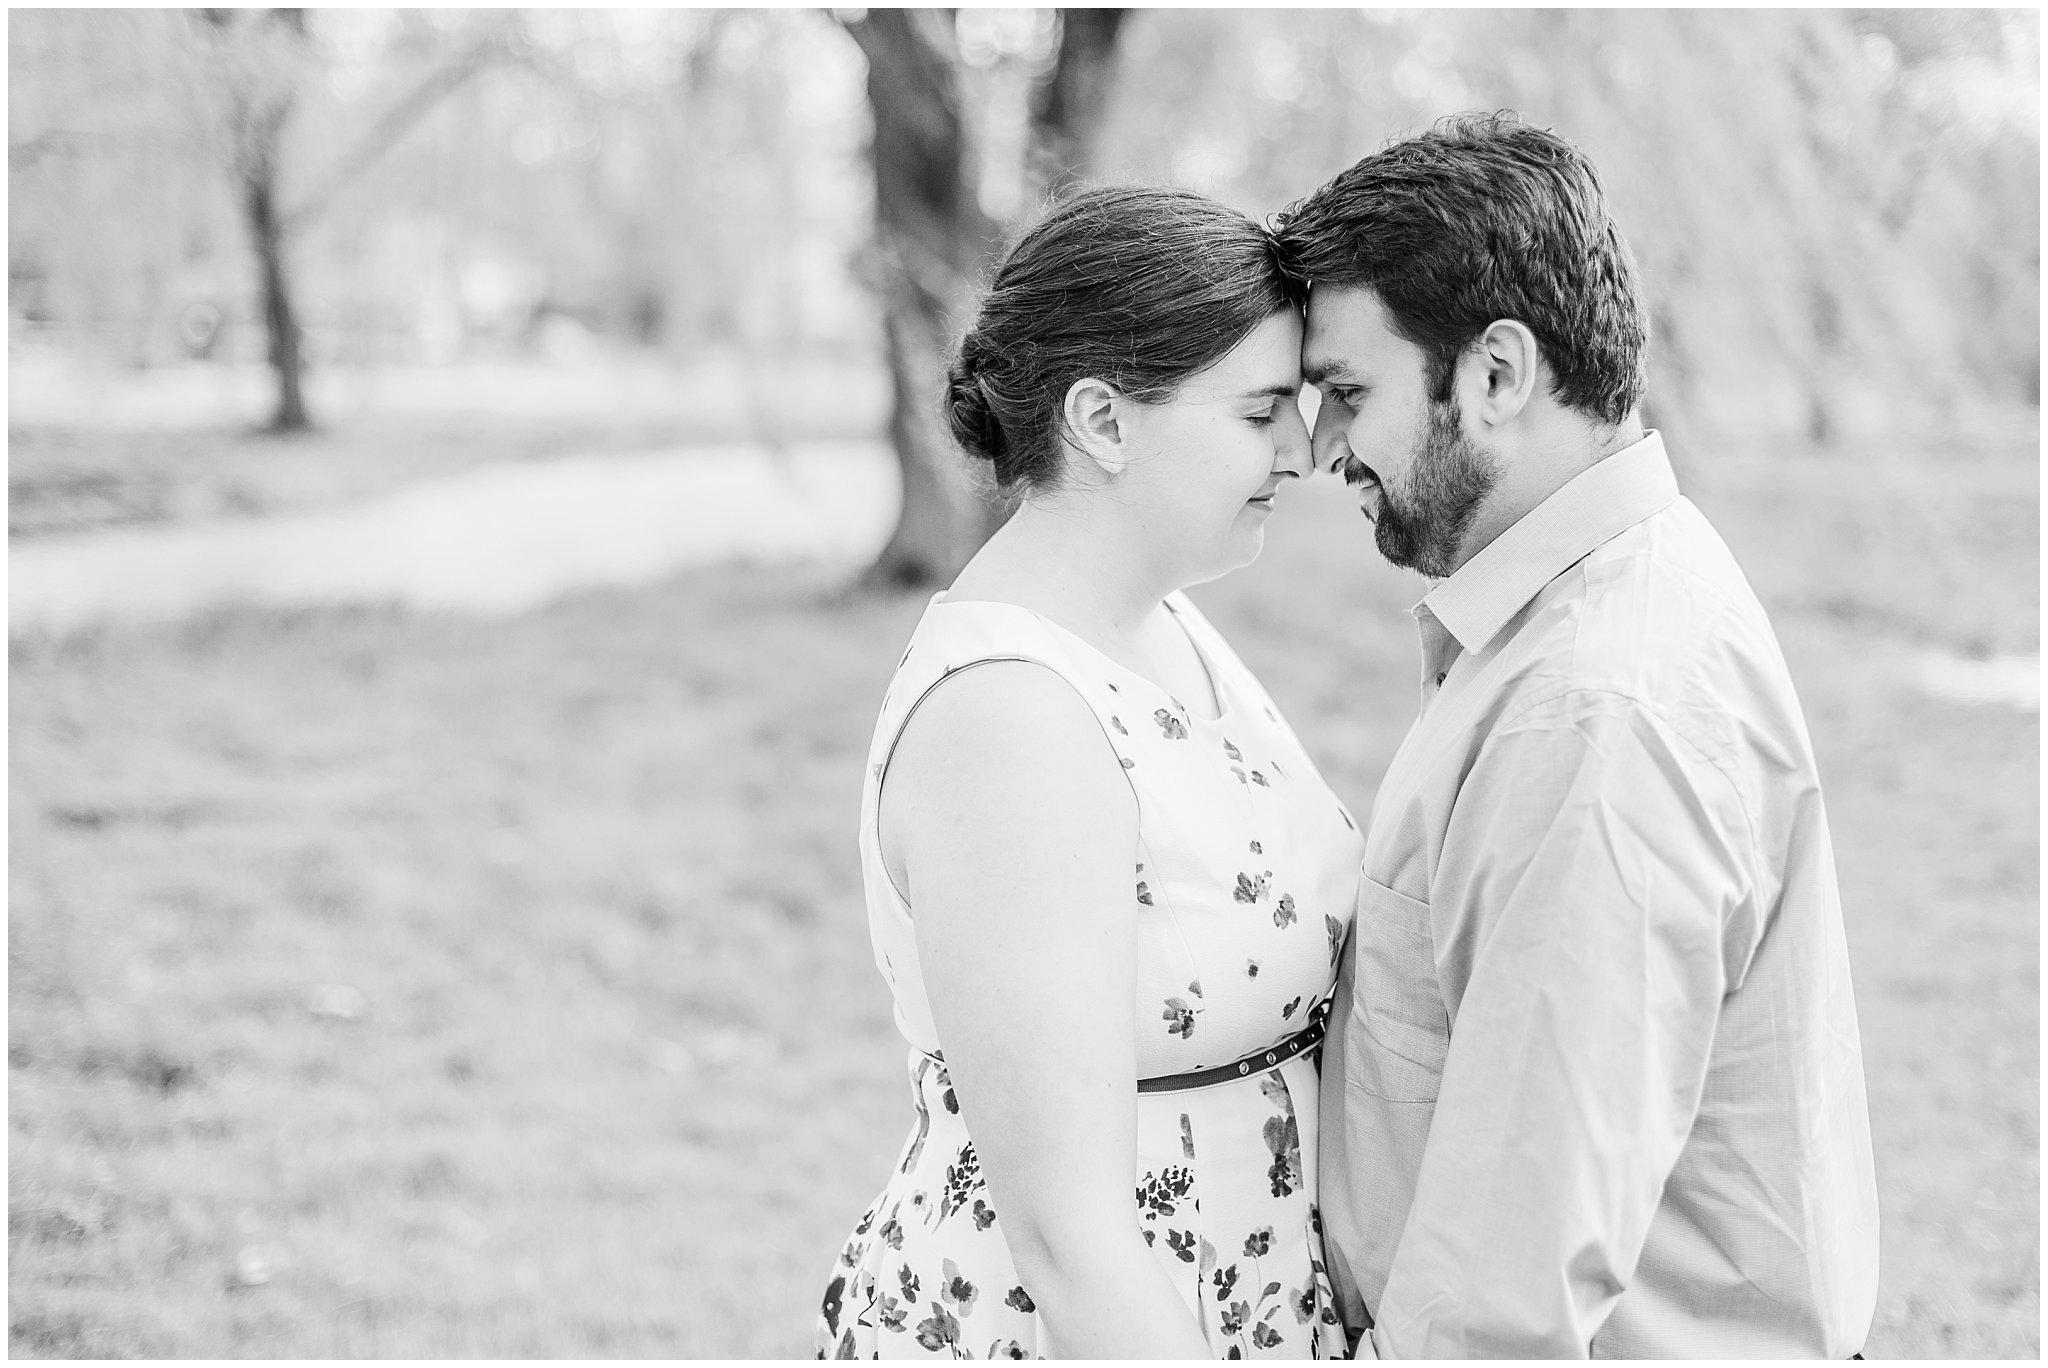 Lehigh Valley Spring Cherry Blossom Engagement Session Pennsylvania Wedding Photographer (27).jpg